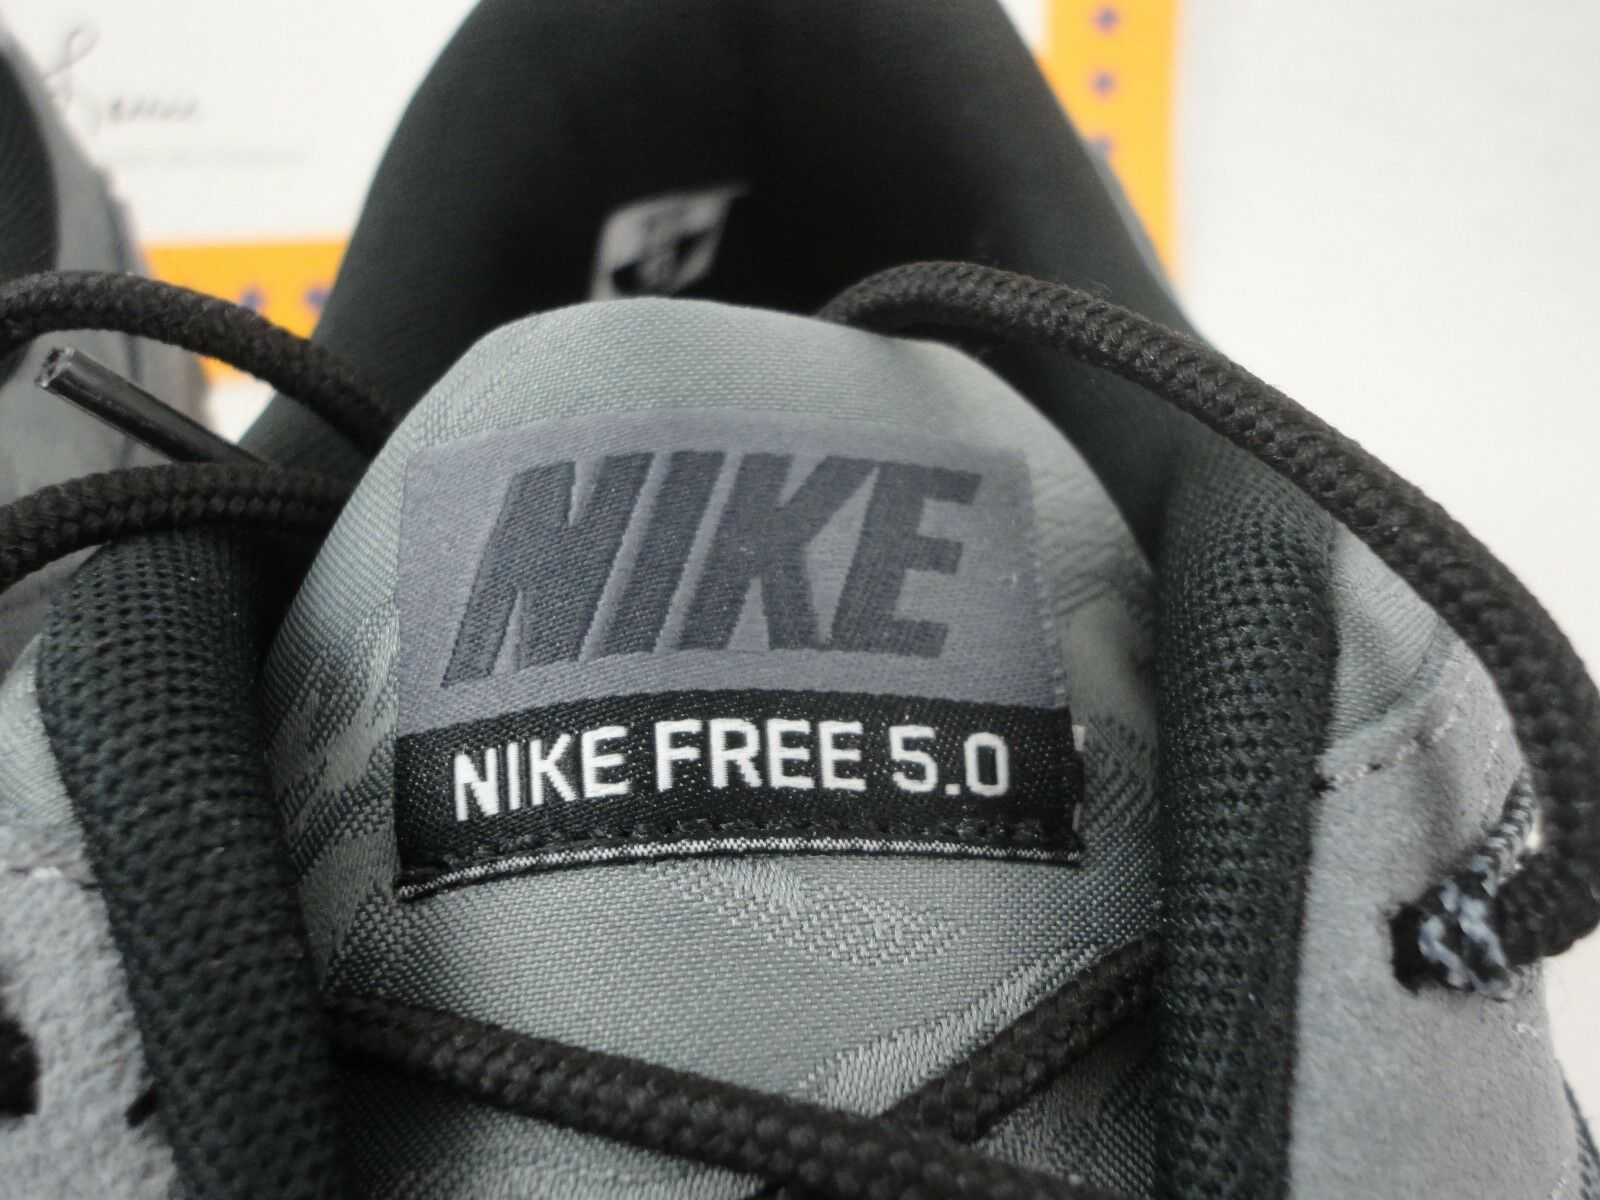 Nike Free 5.0 EXT, Cool Grey / Silver, 2013, Presto, Size 13